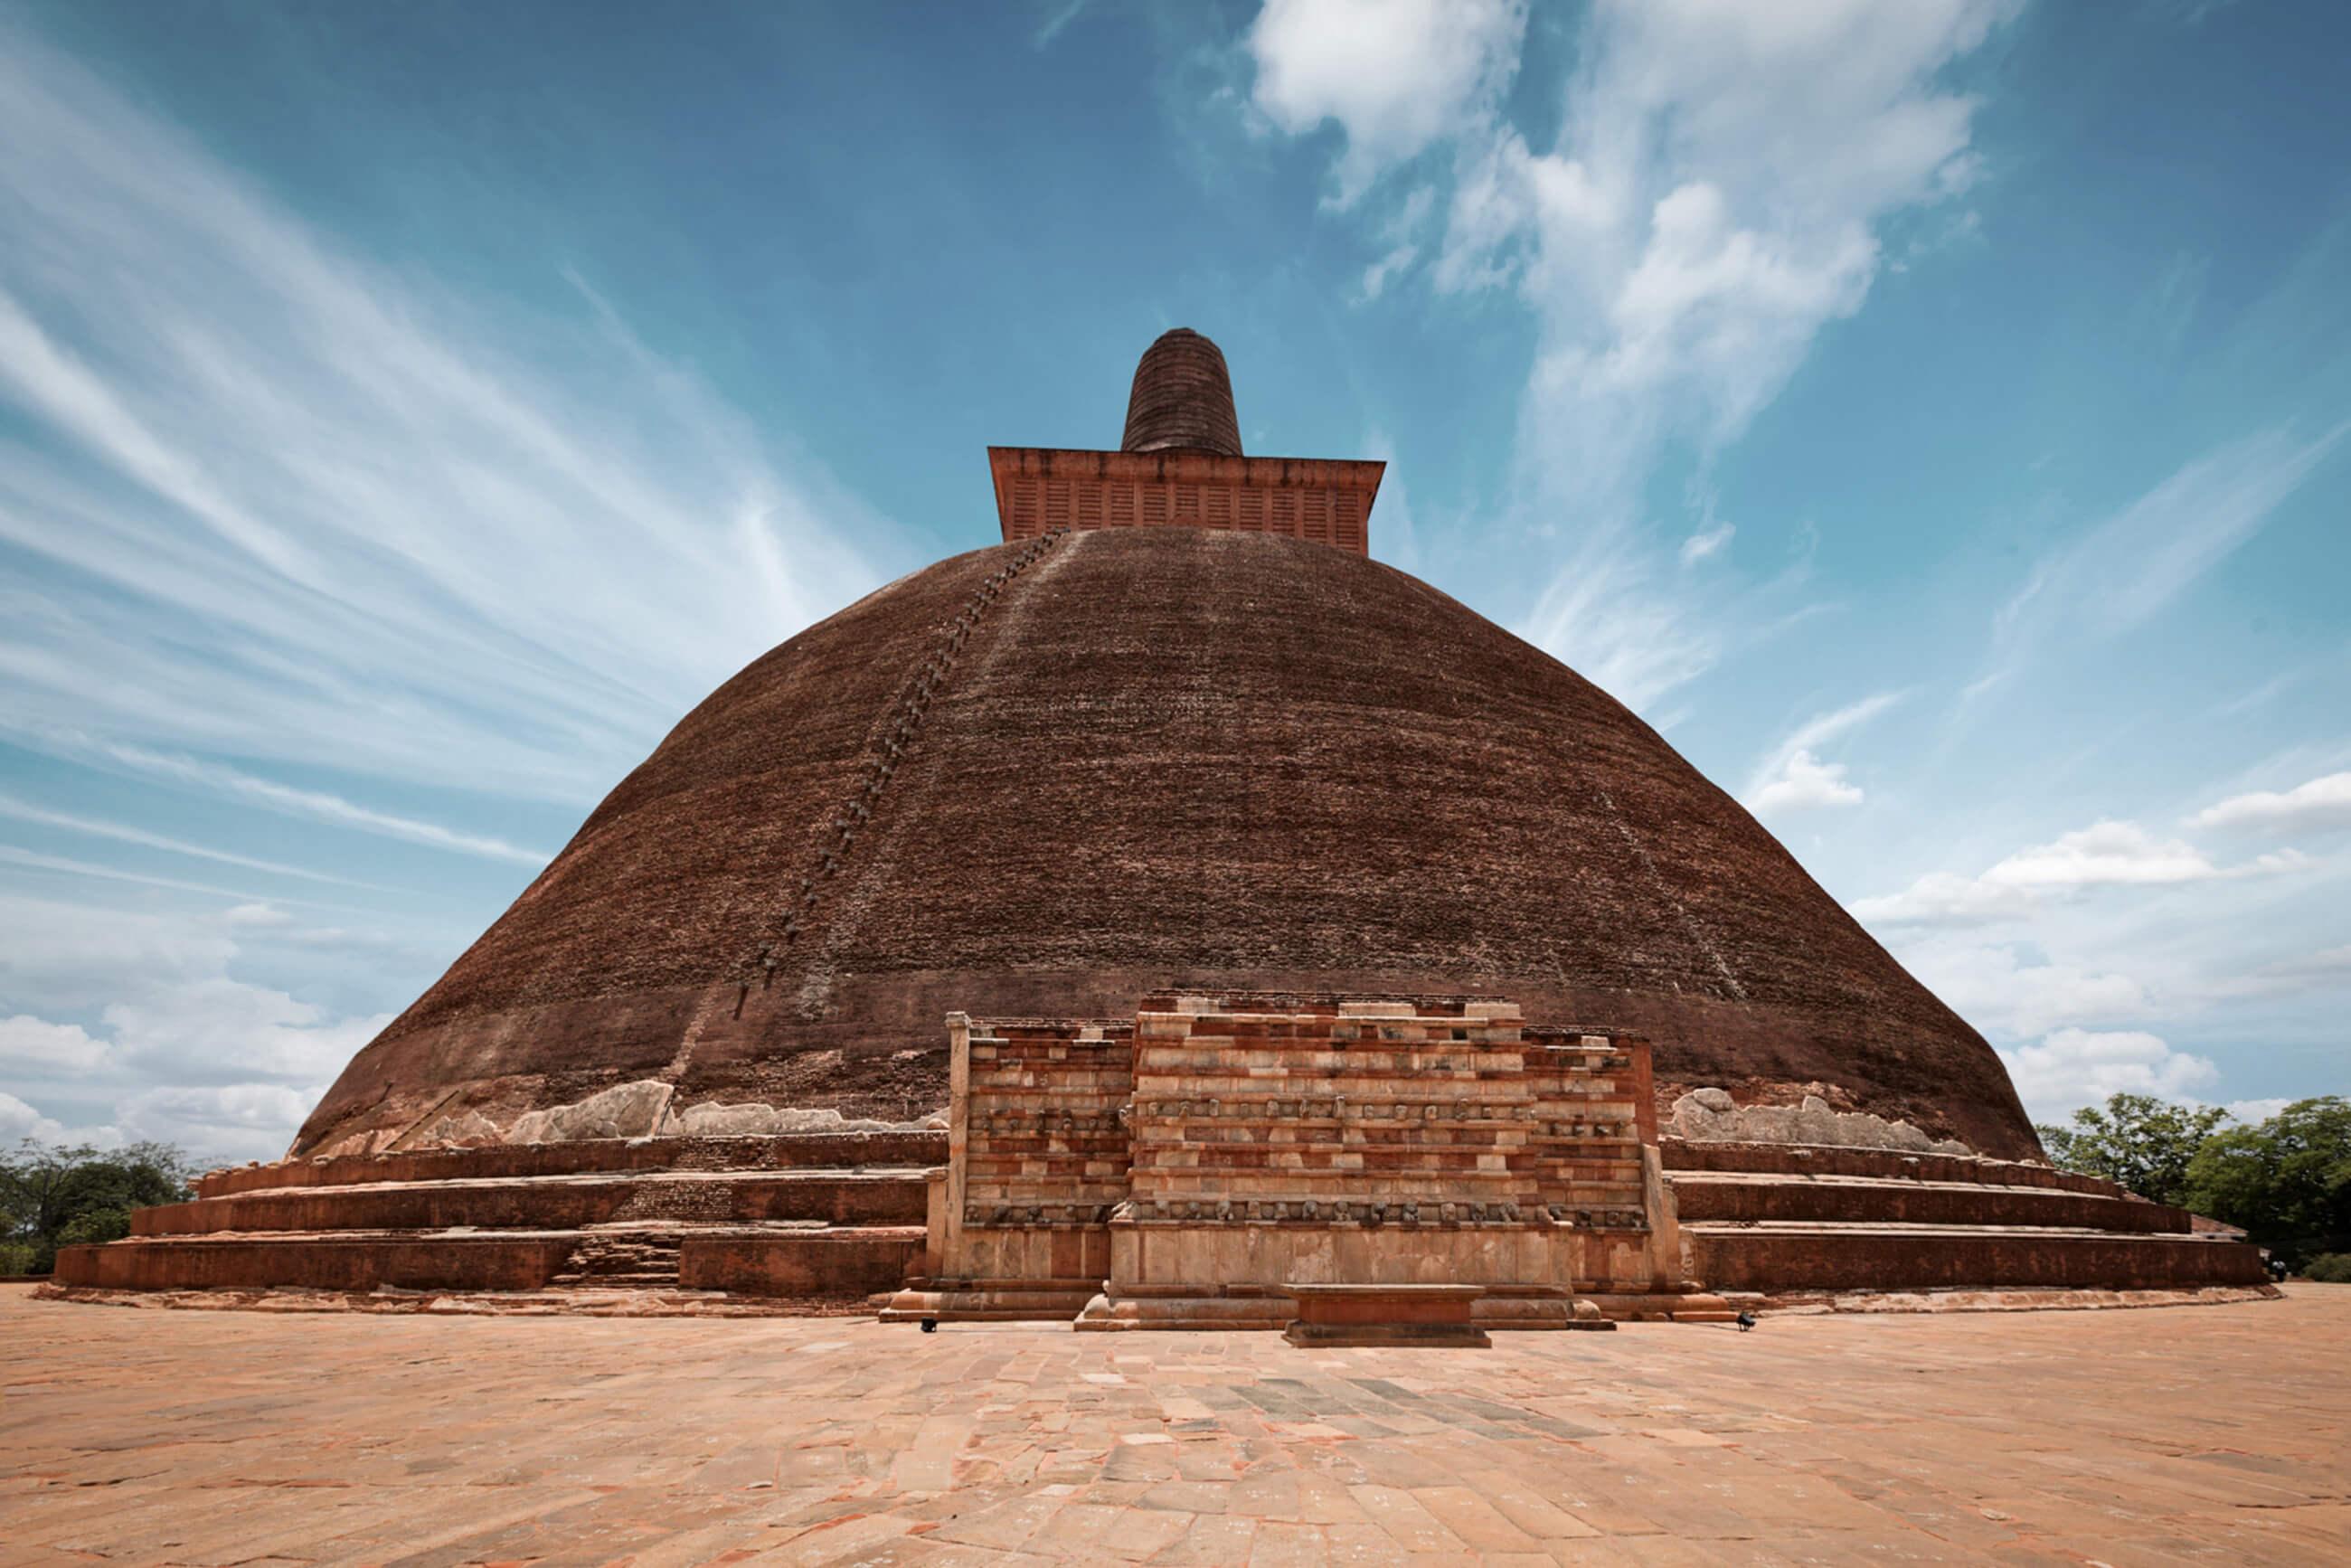 https://bubo.sk/uploads/galleries/7521/4425_sri-lanka-jetavaranama-dagoba-stupa-anuradhapura.jpg